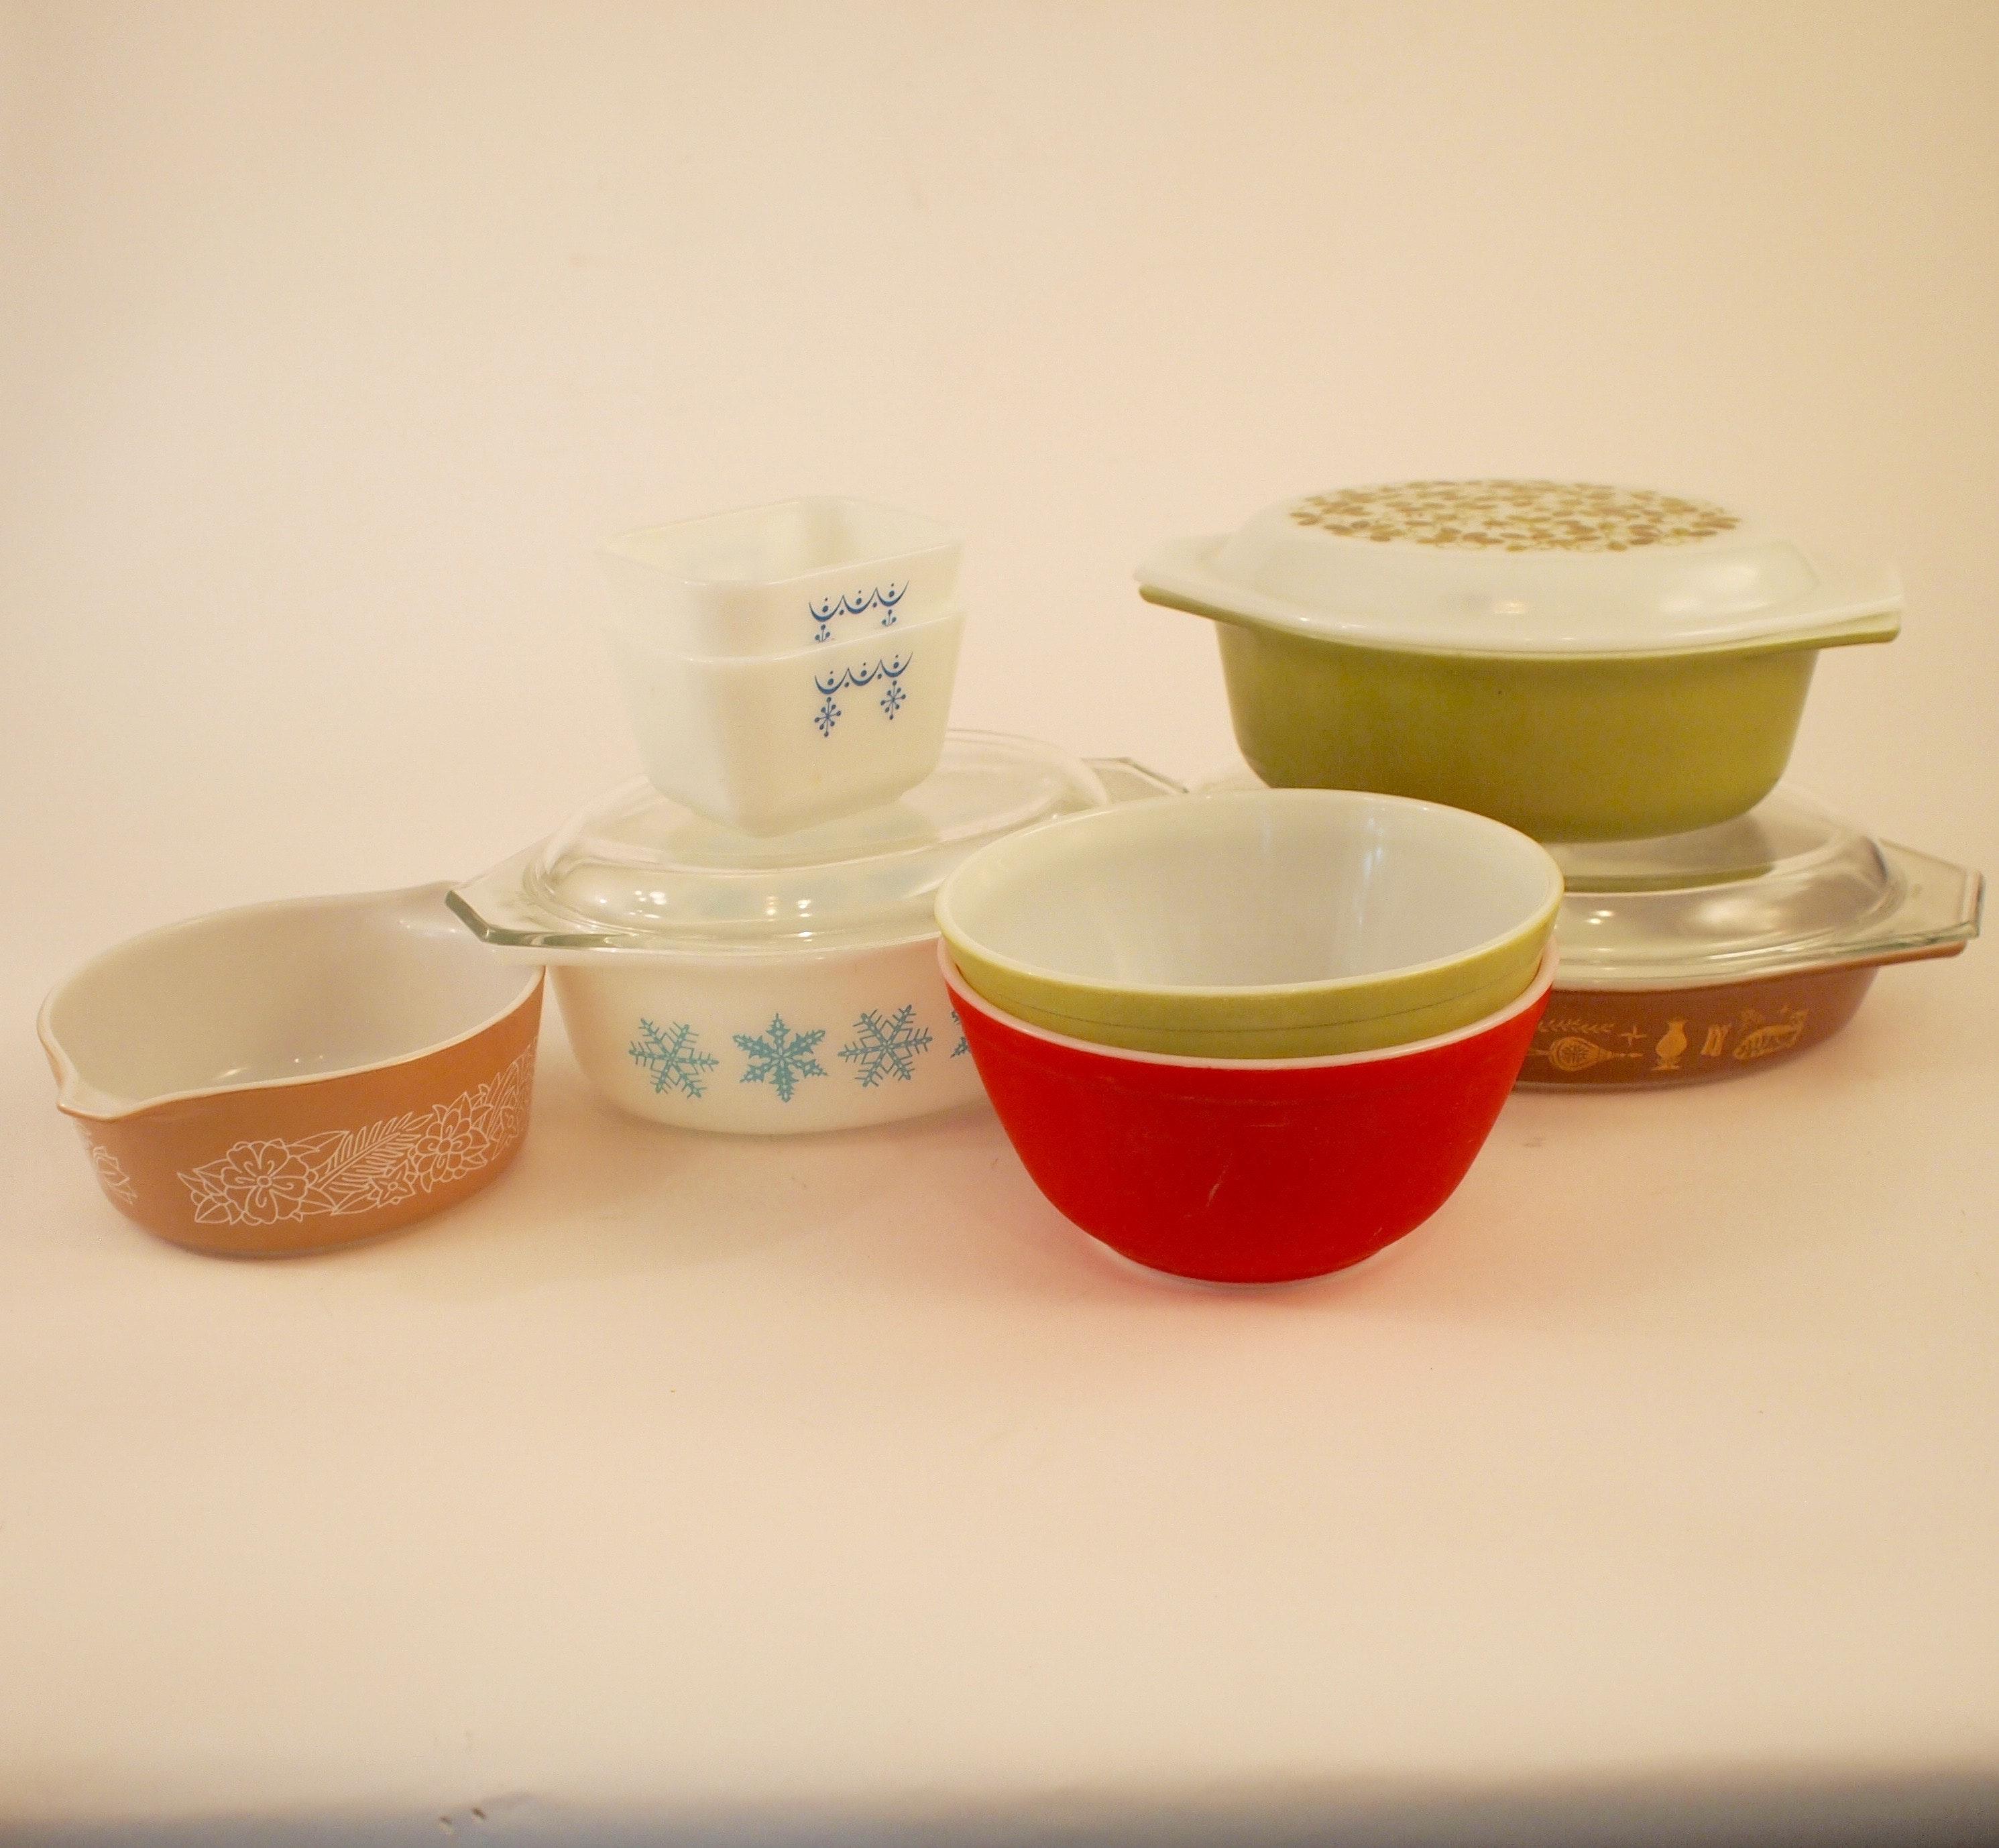 Vintage Pyrex Bowls and Casseroles